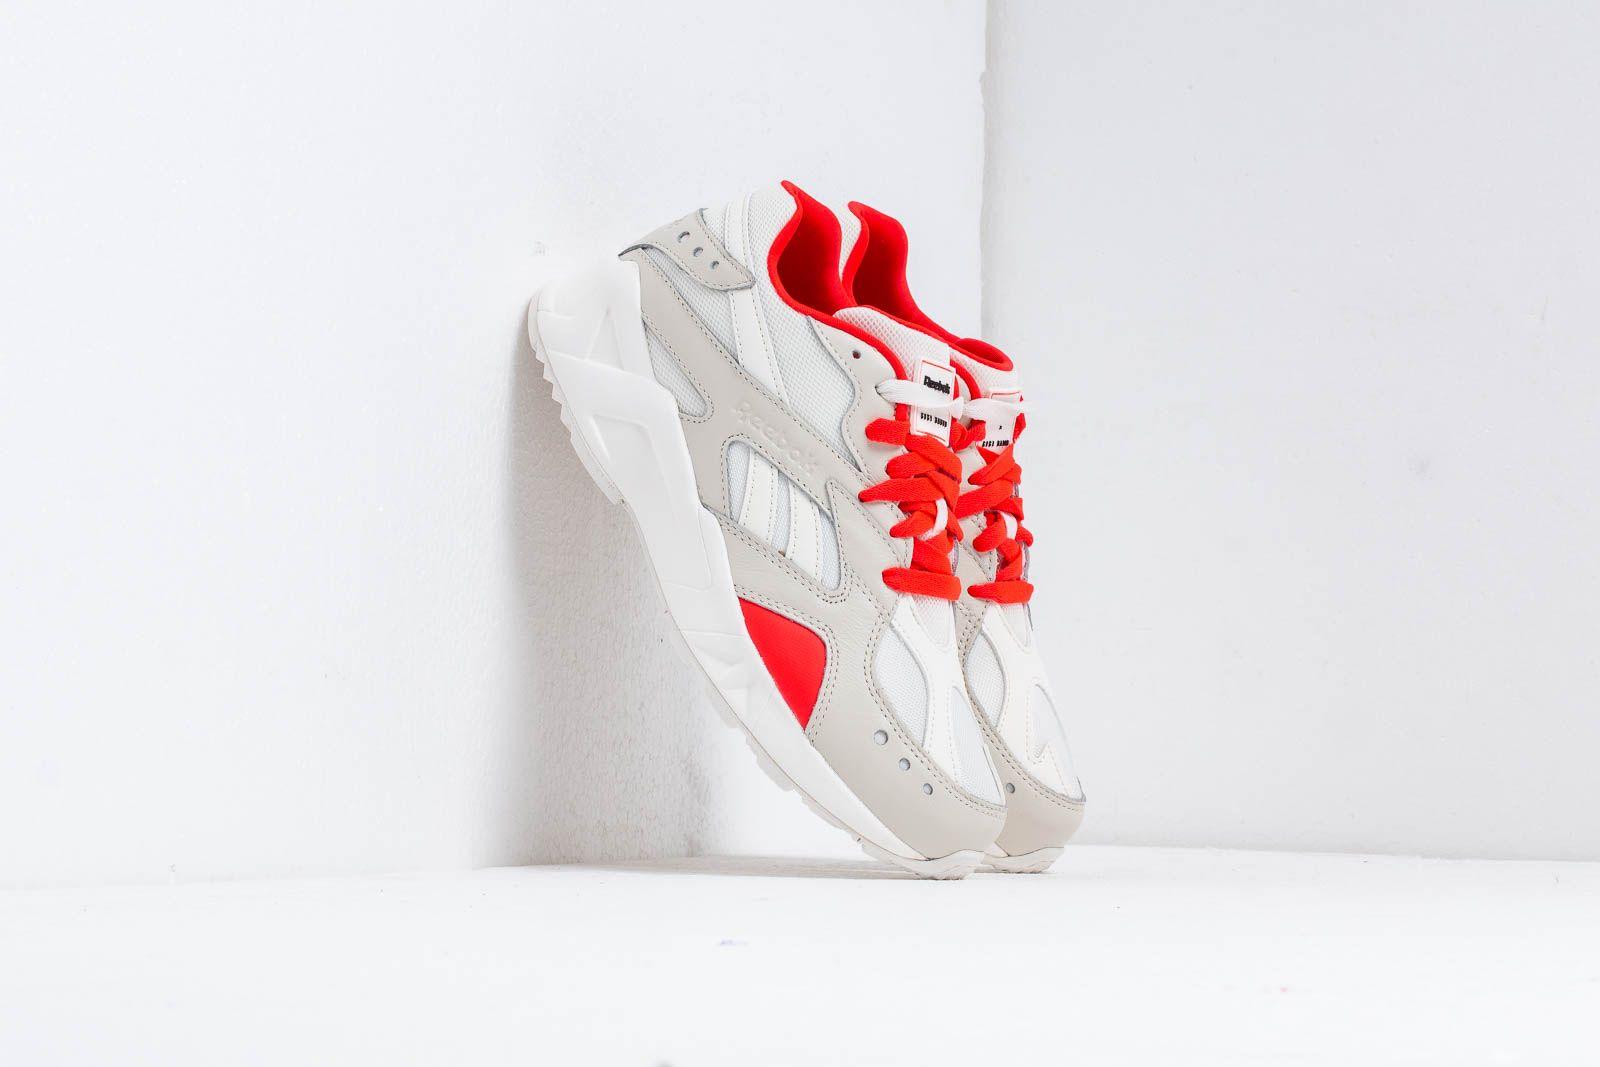 Reebok Aztrek Chalk/ Neon Red/ Black za skvelú cenu 114 € kúpite na Footshop.sk